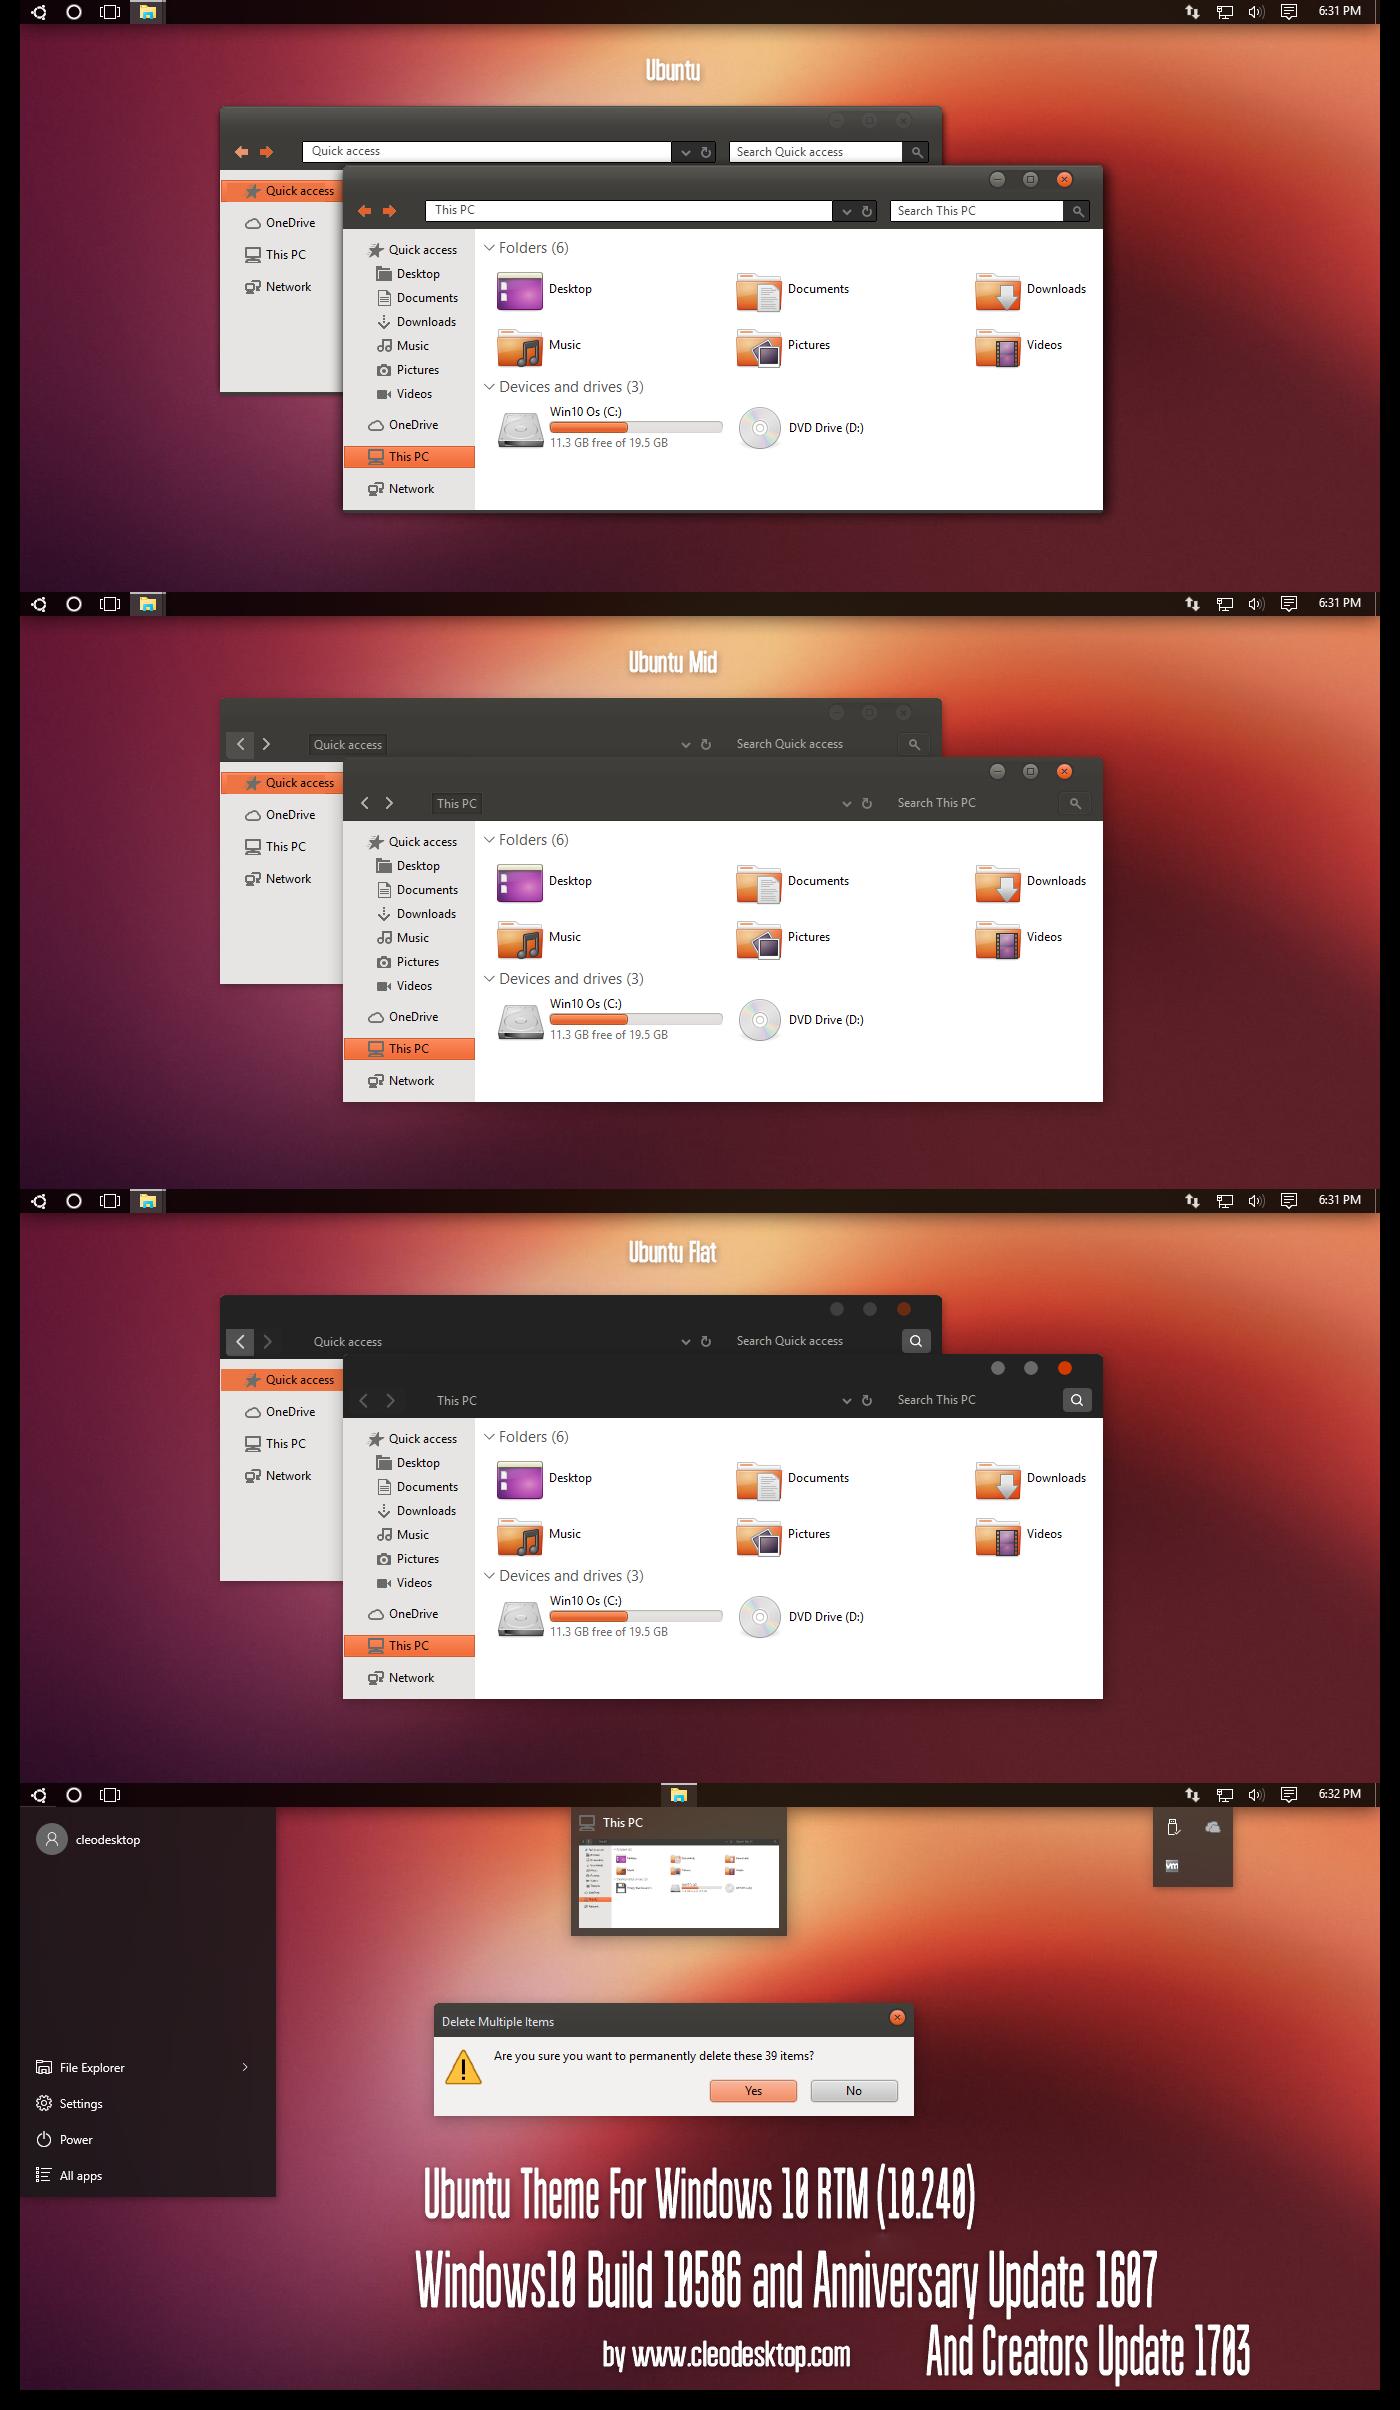 Ubuntu Theme Win10 Creators Update